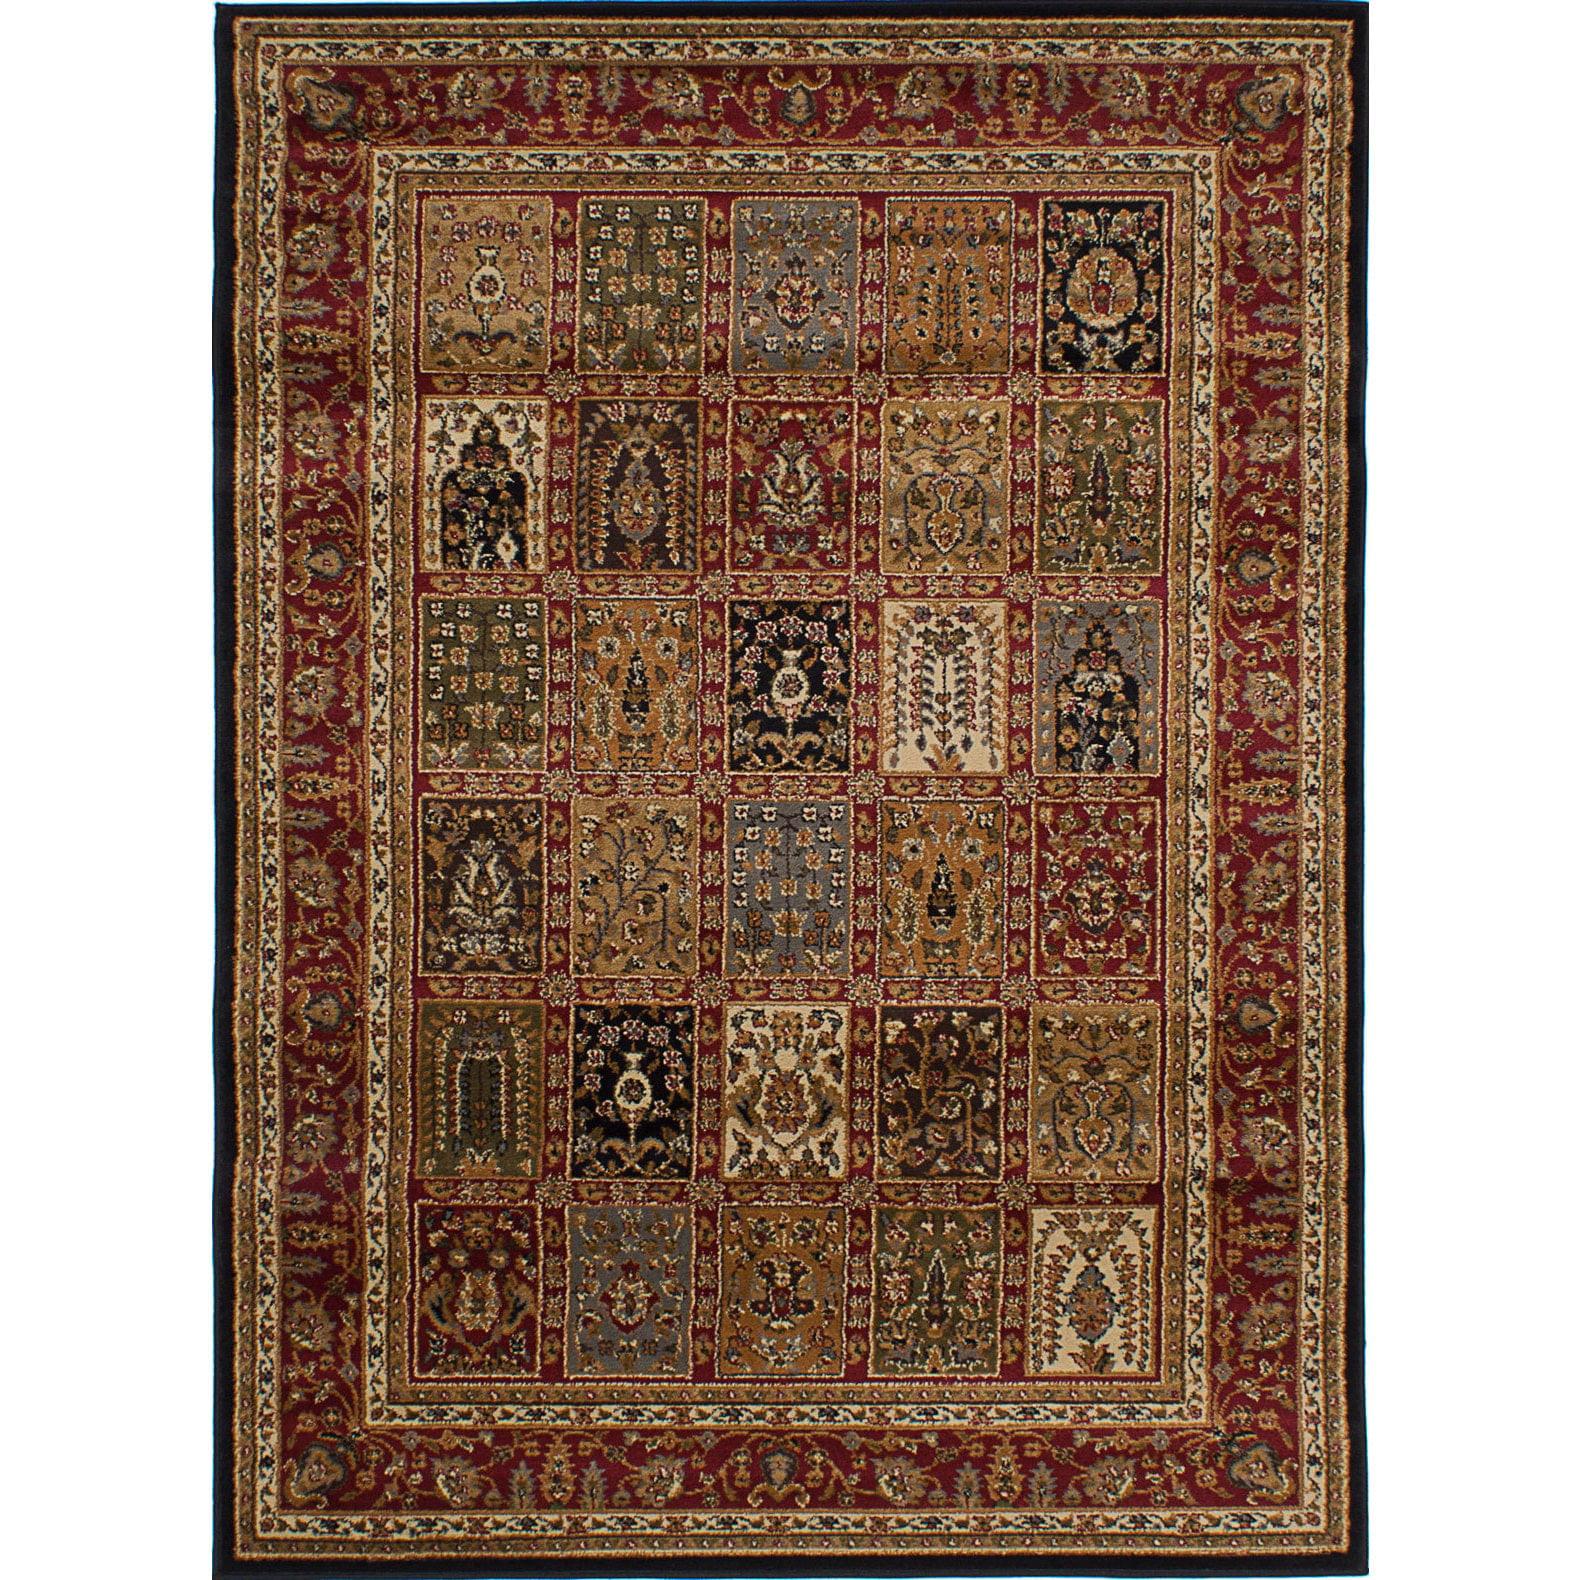 Ecarpetgallery  Handmade Royale Red Rug (5'3x7'4)